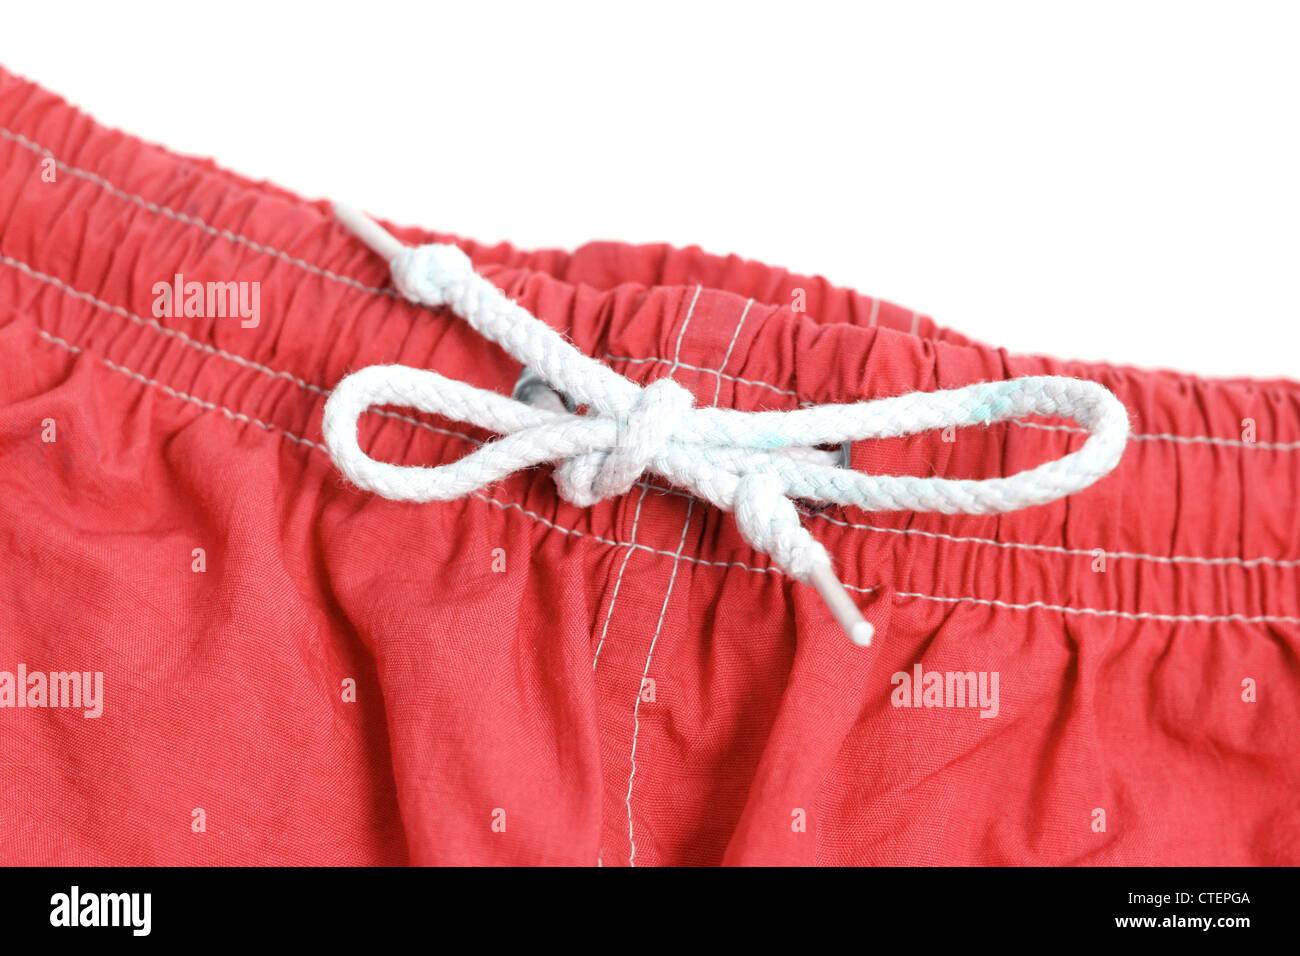 Swimming shorts - Stock Image